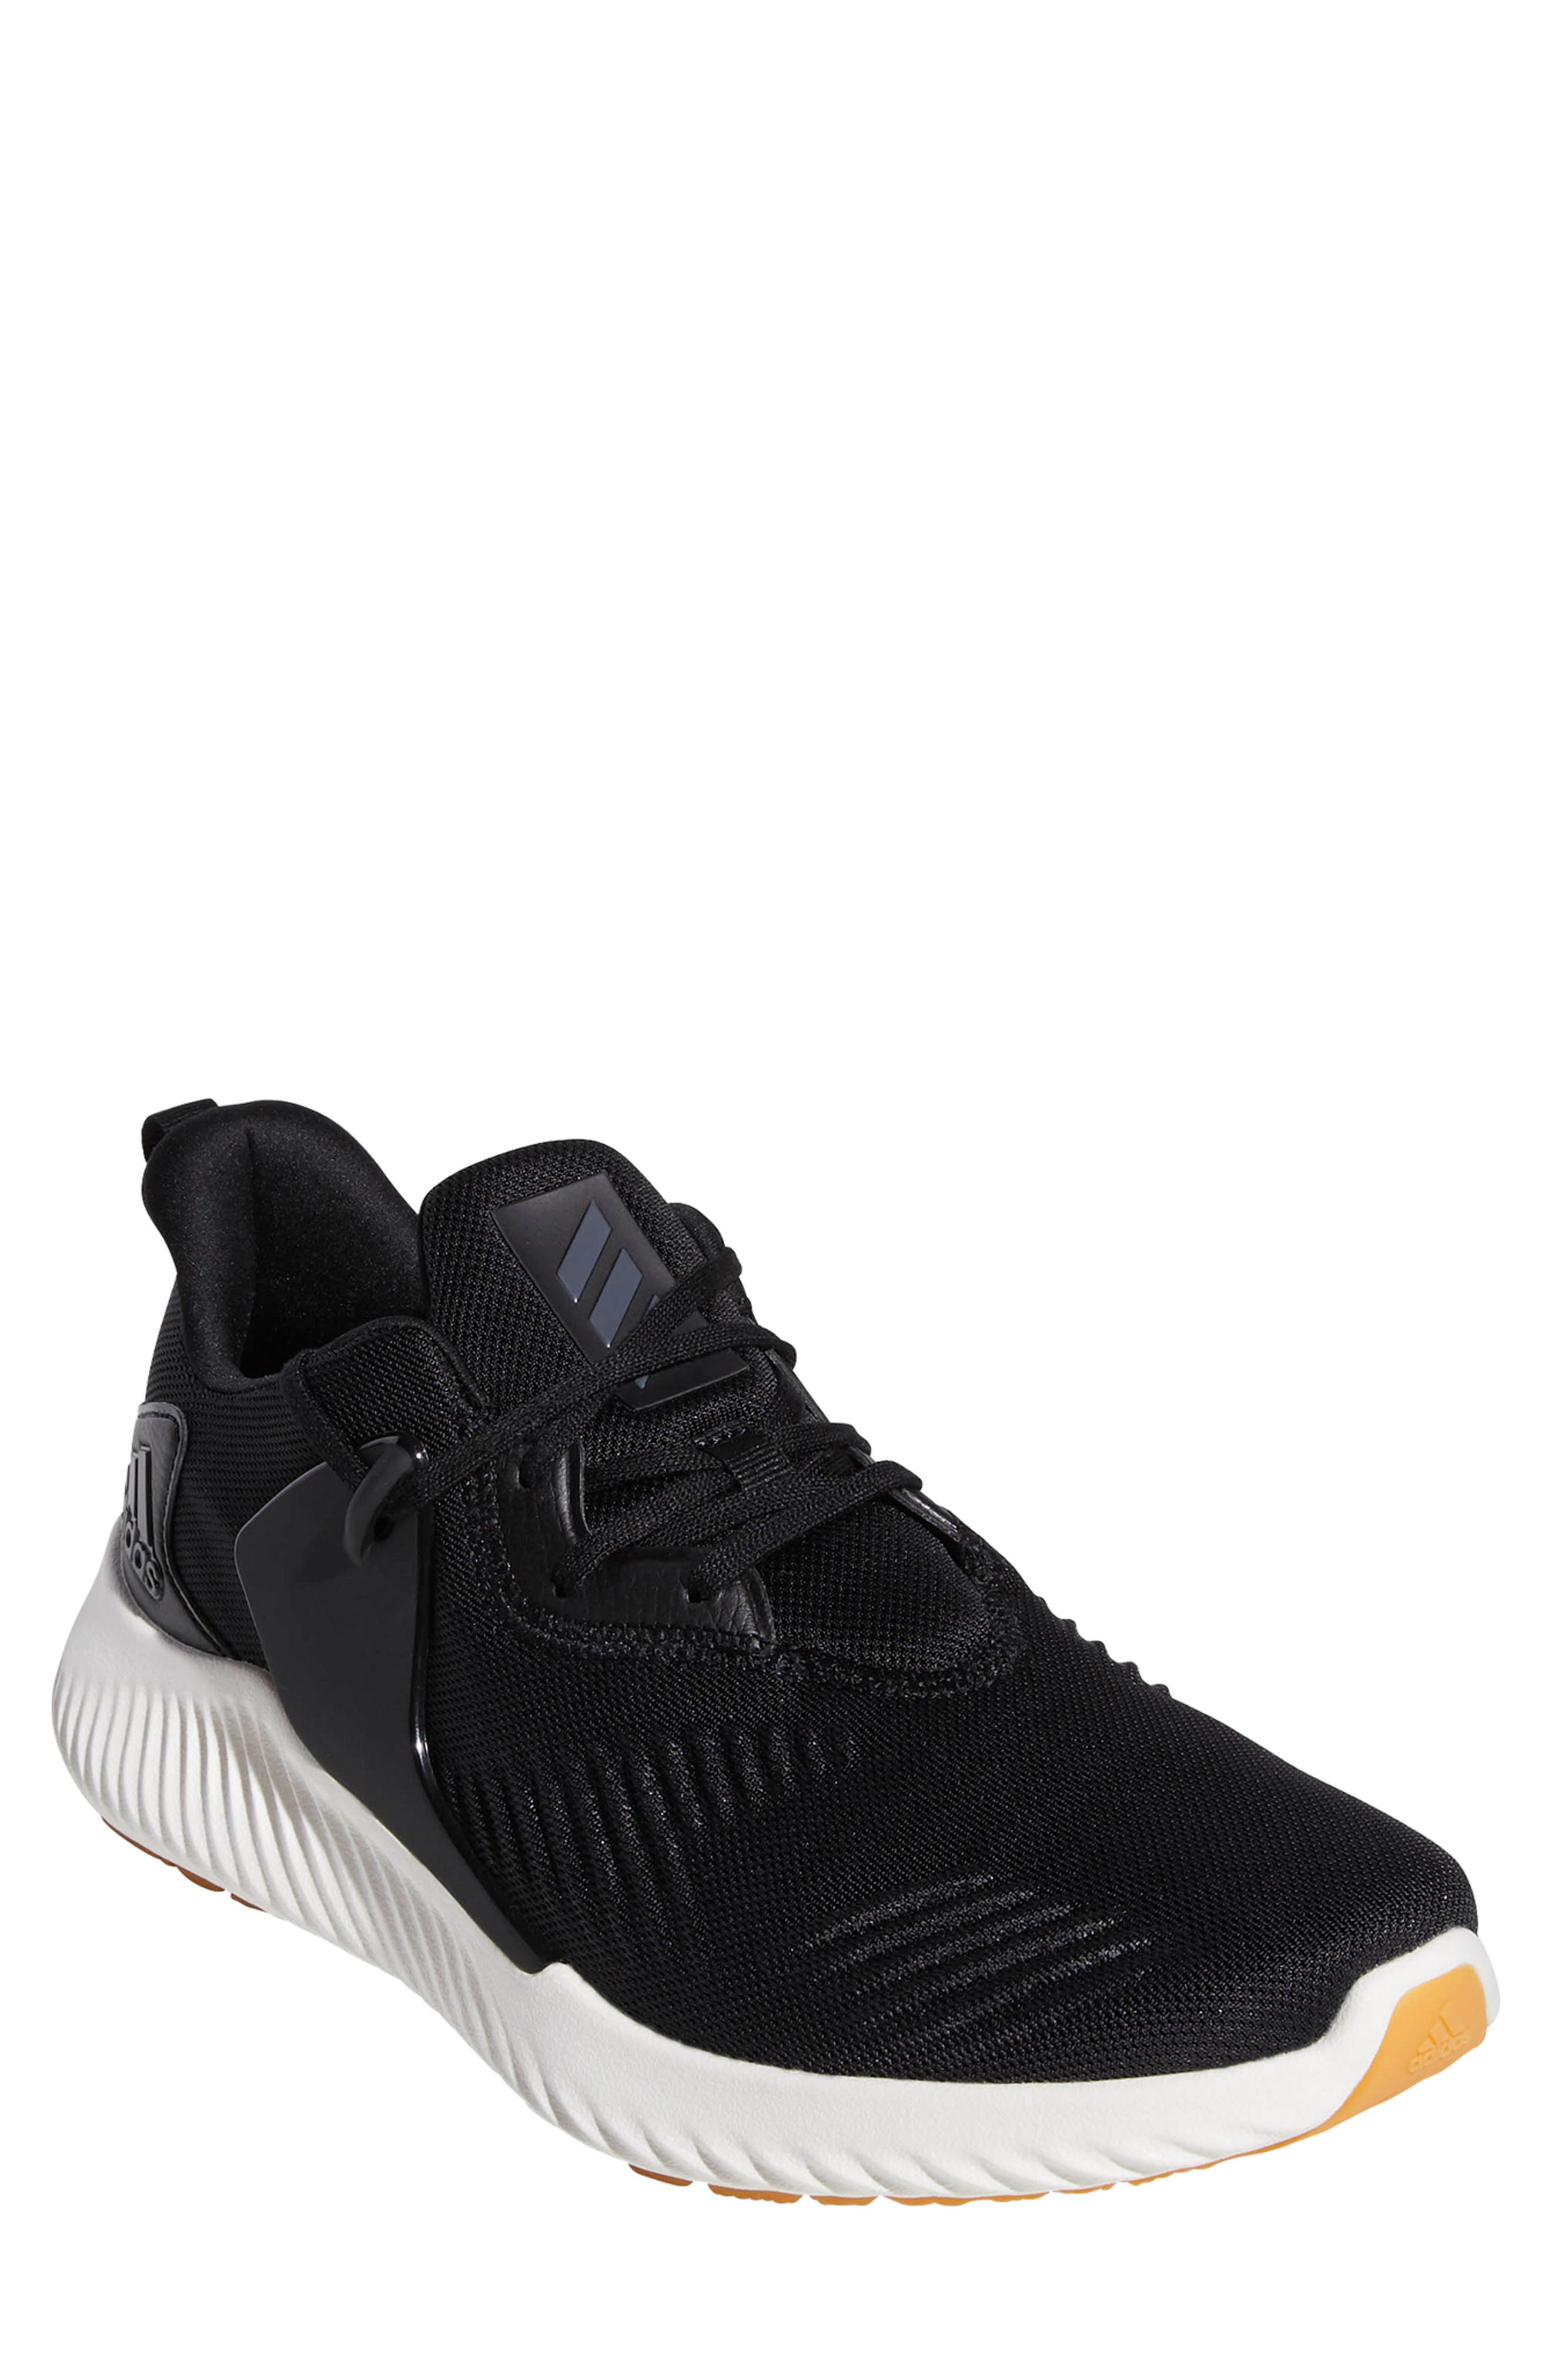 AlphaBounce RC 2 Running Shoe,                             Main thumbnail 1, color,                             CORE BLACK/ NIGHT/ CORE BLACK